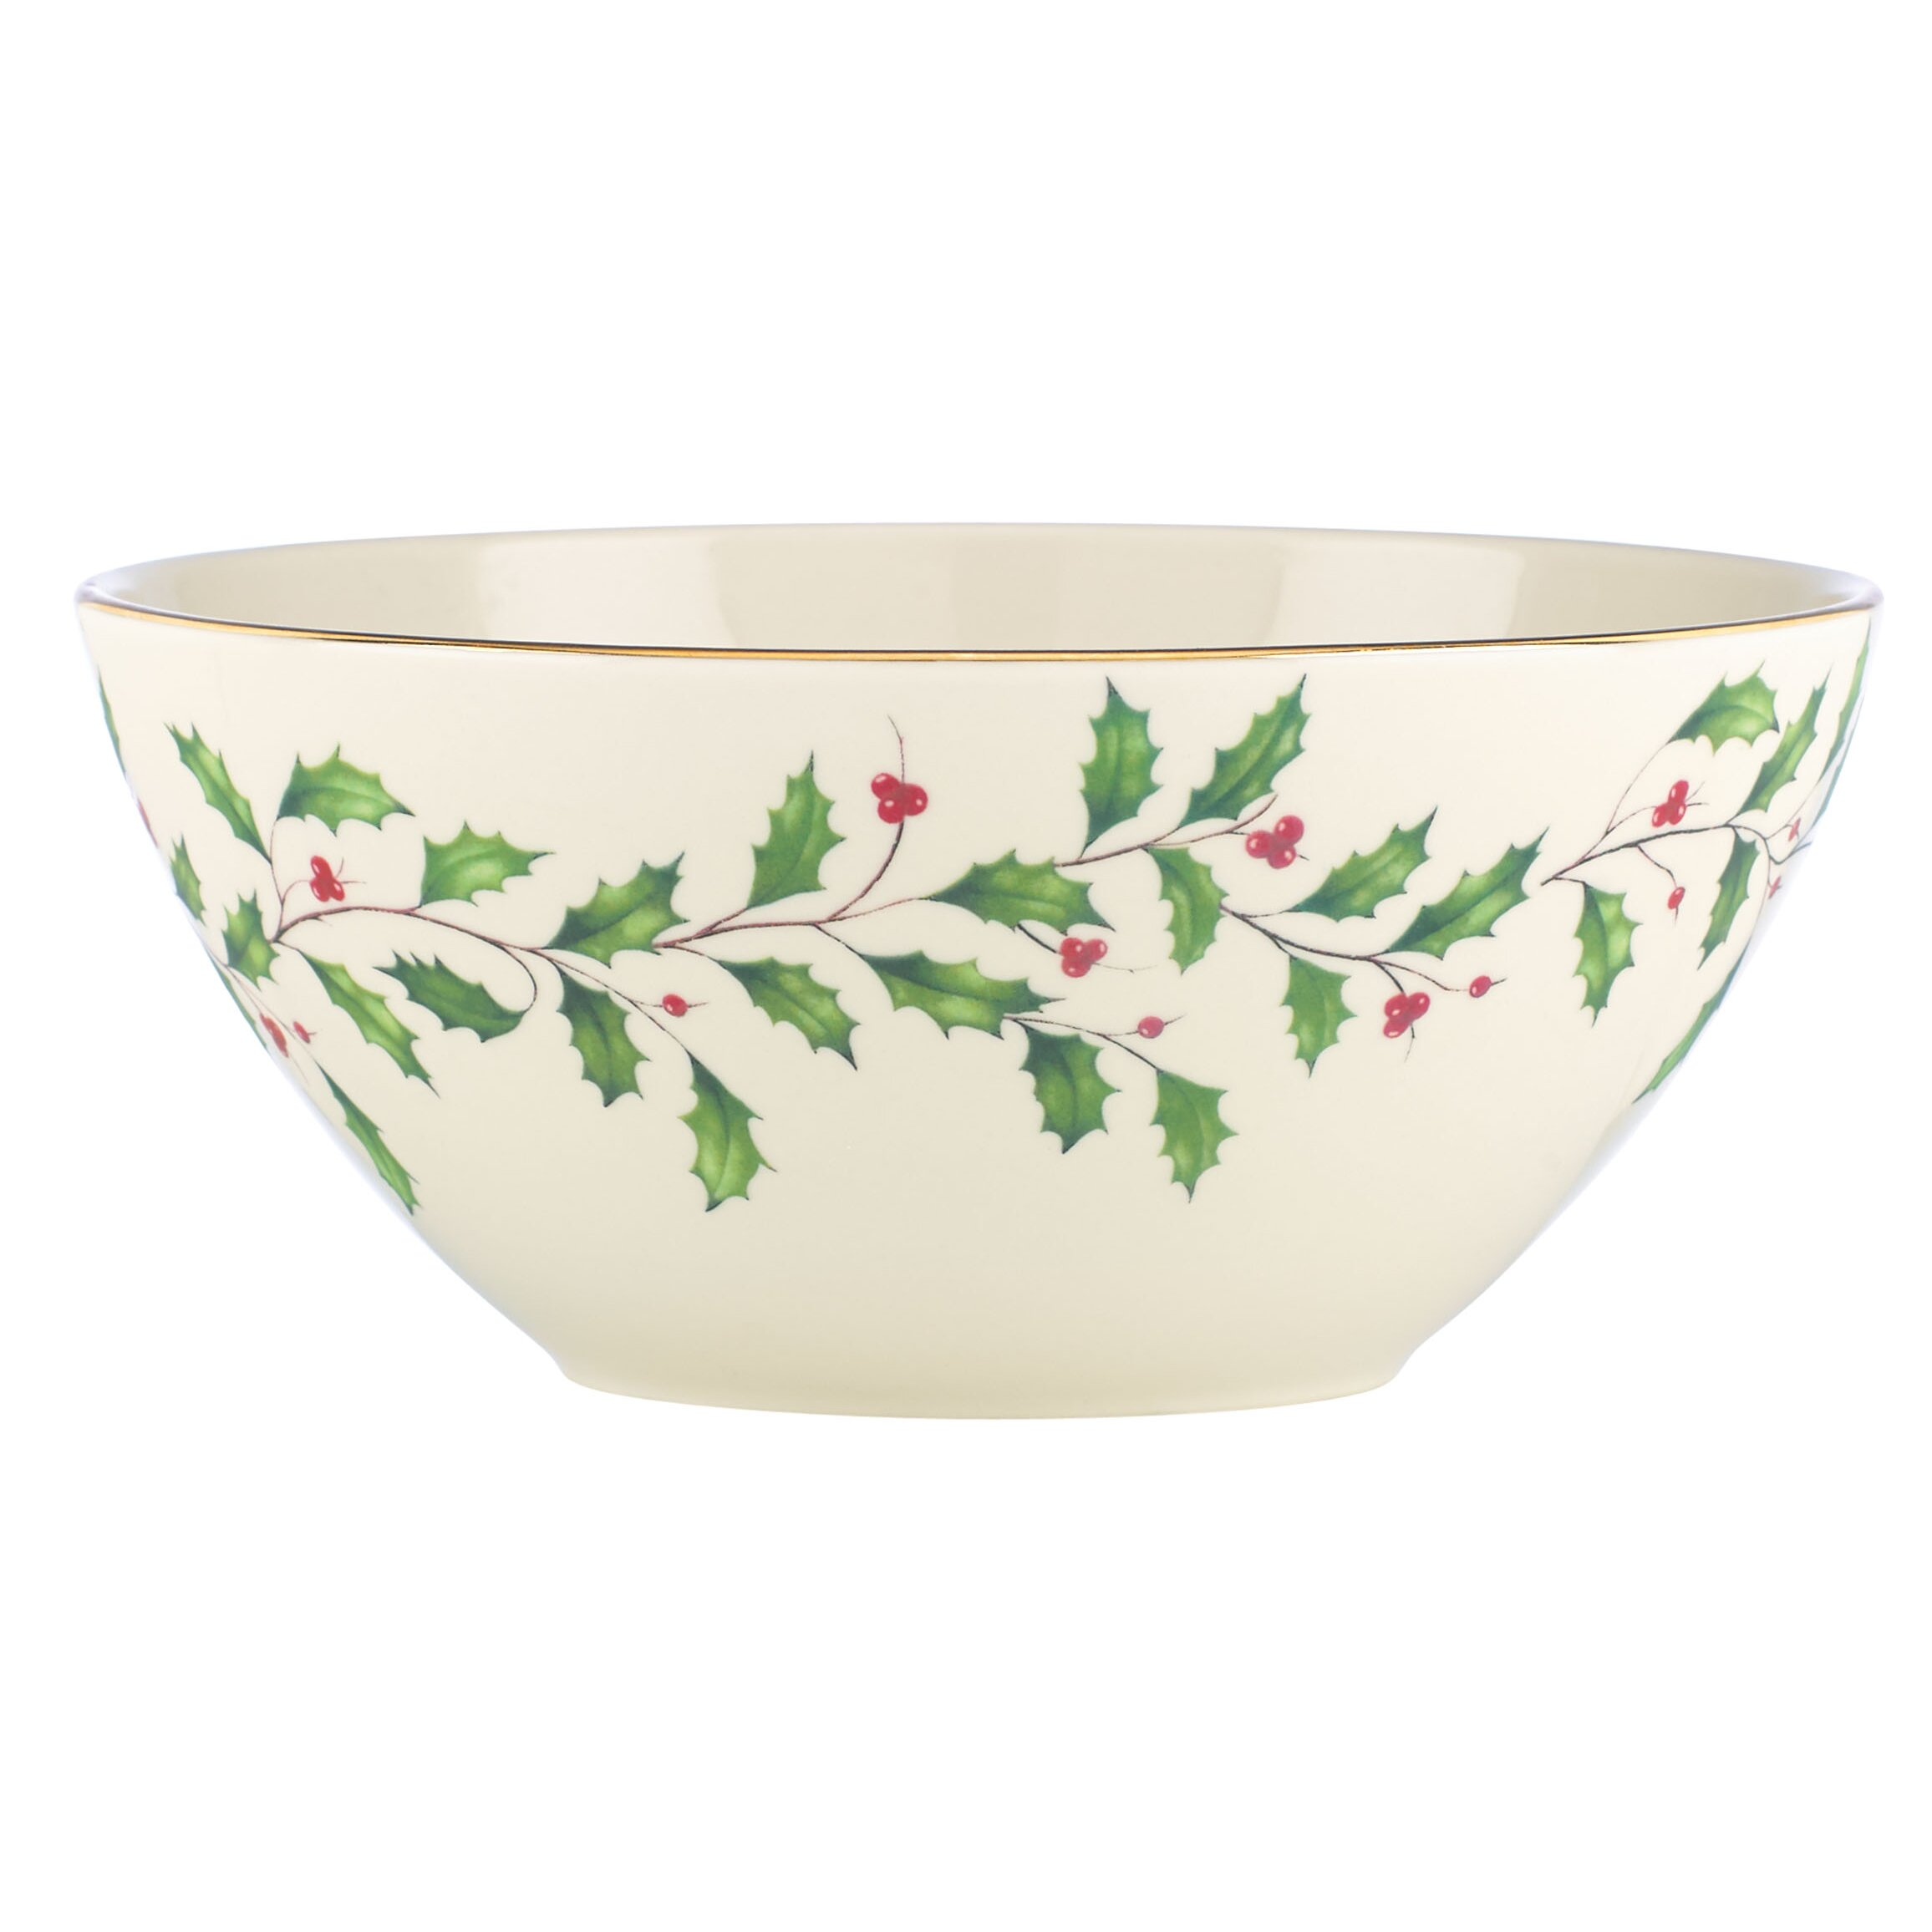 Lenox Holiday Serving Bowl Wayfair